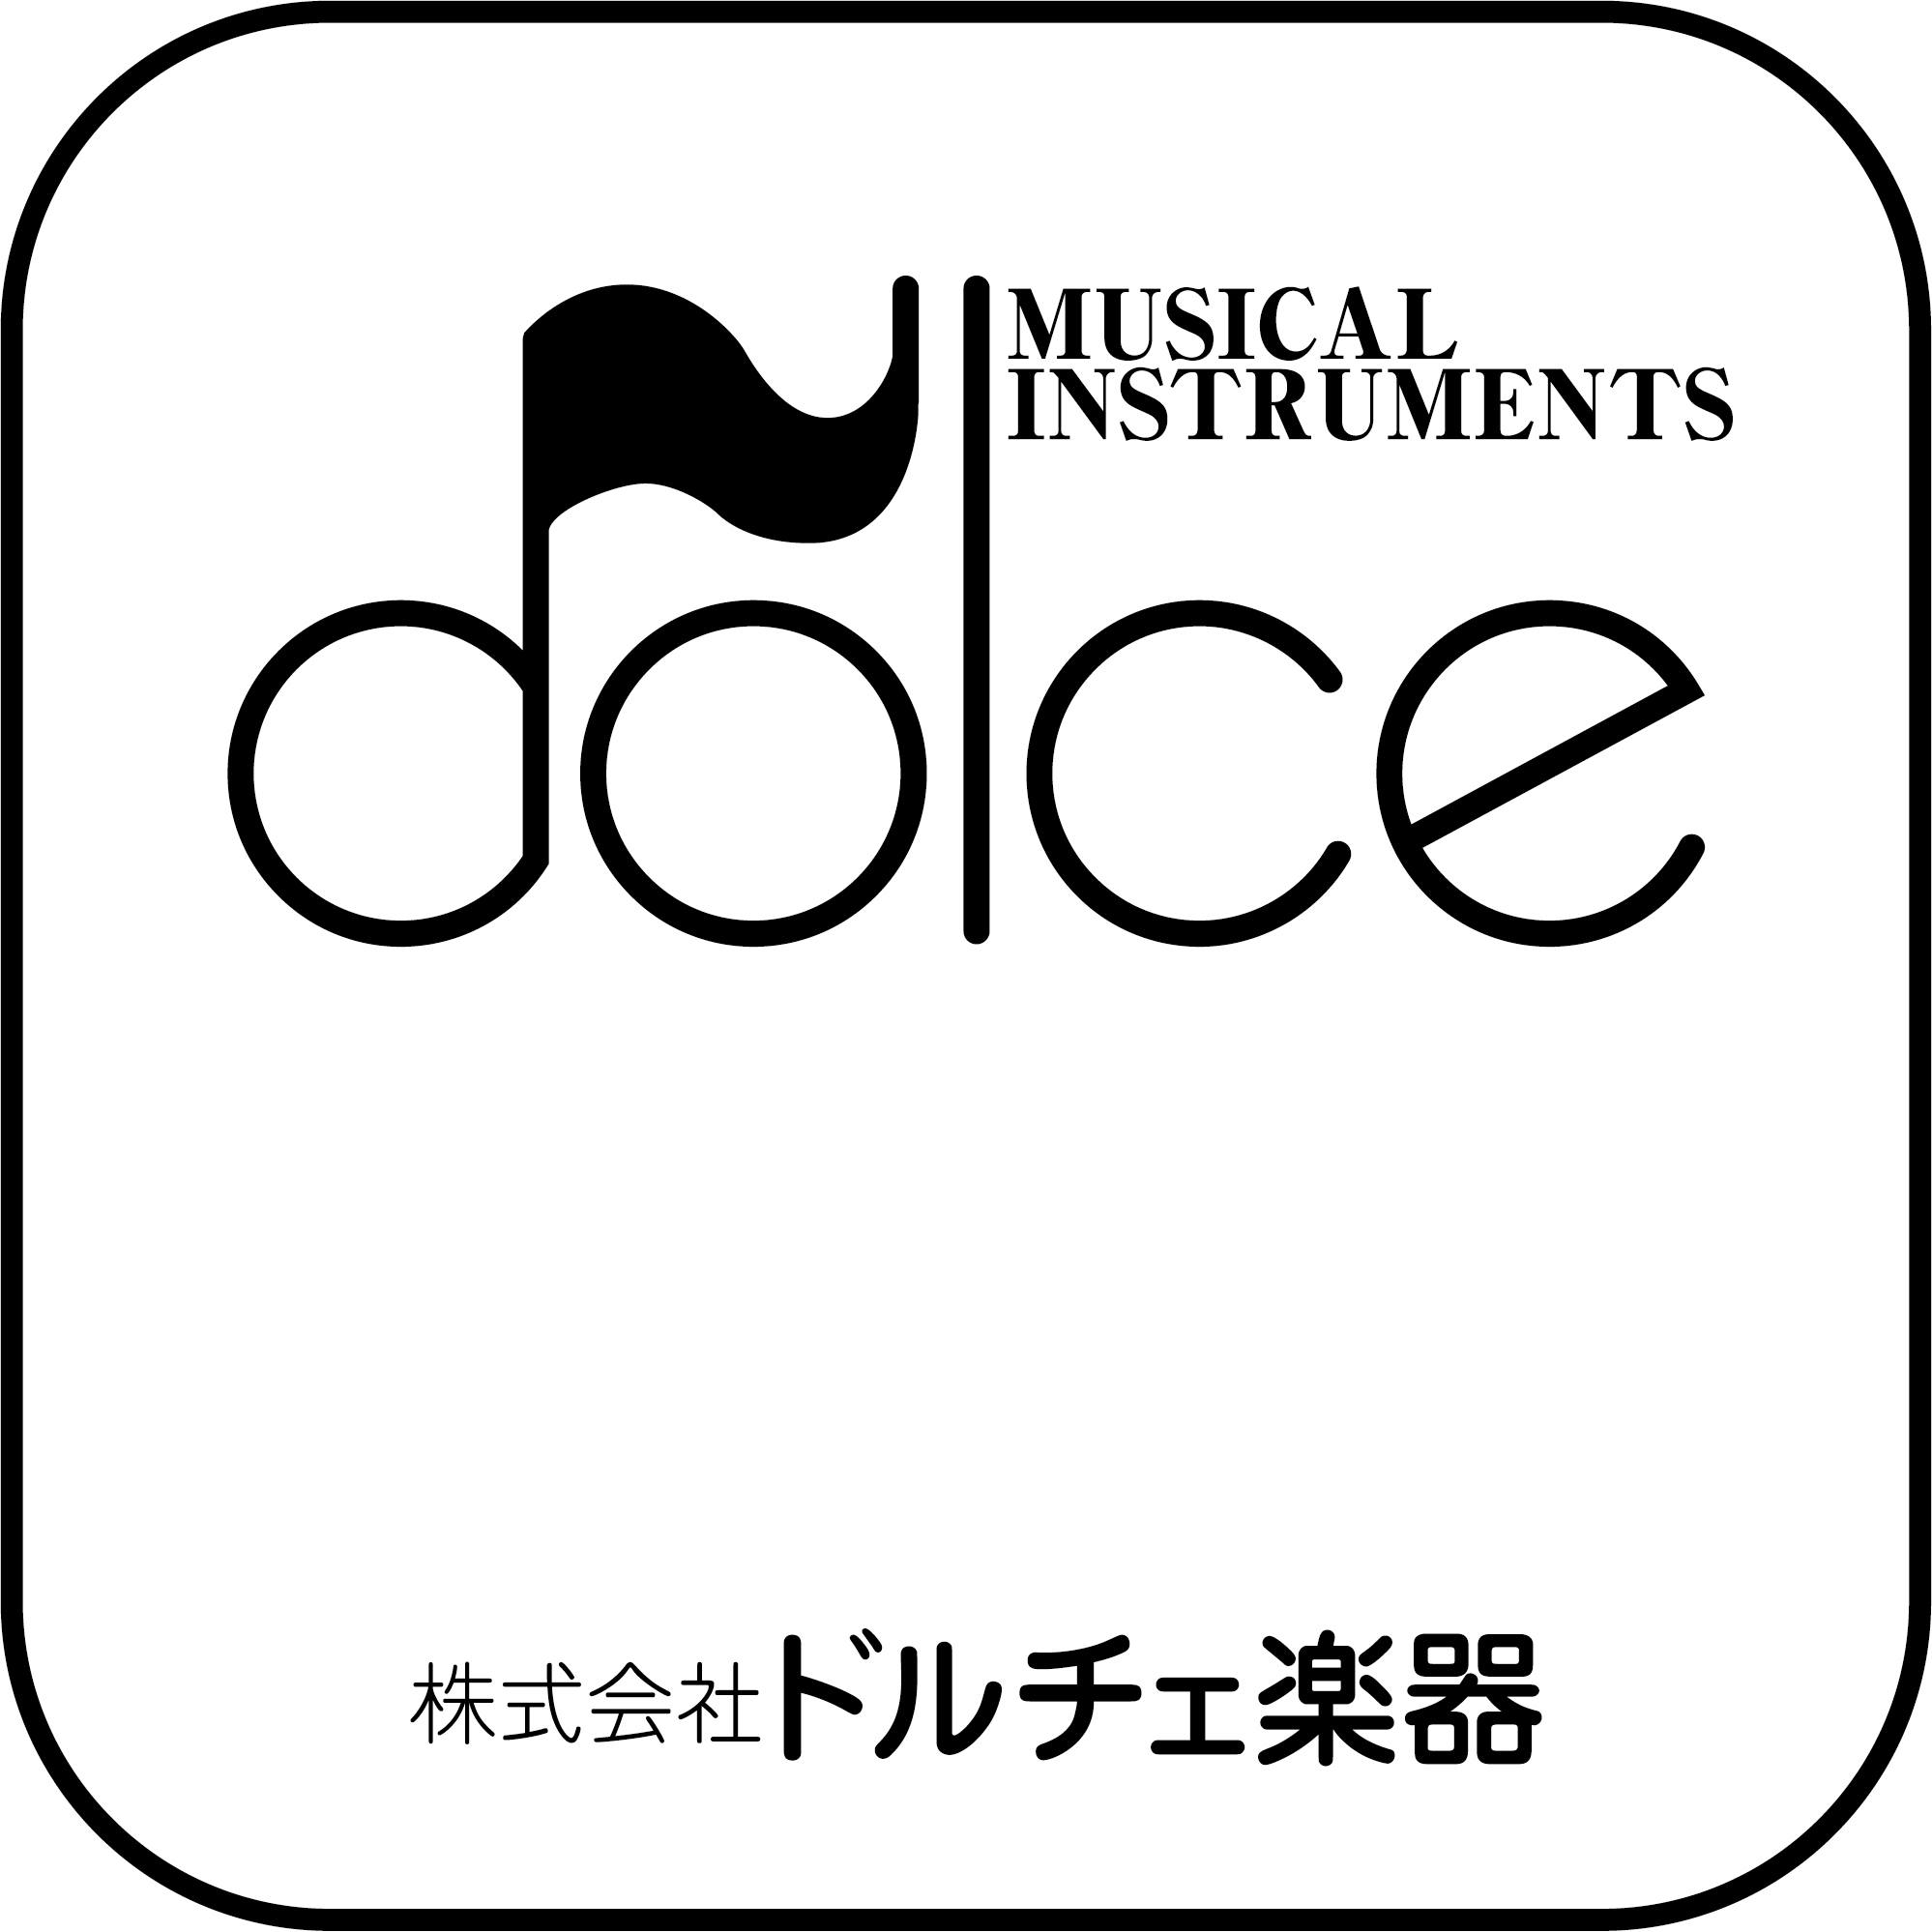 Dolce   Musical Instruments - Nagoya  Custom & Q Series